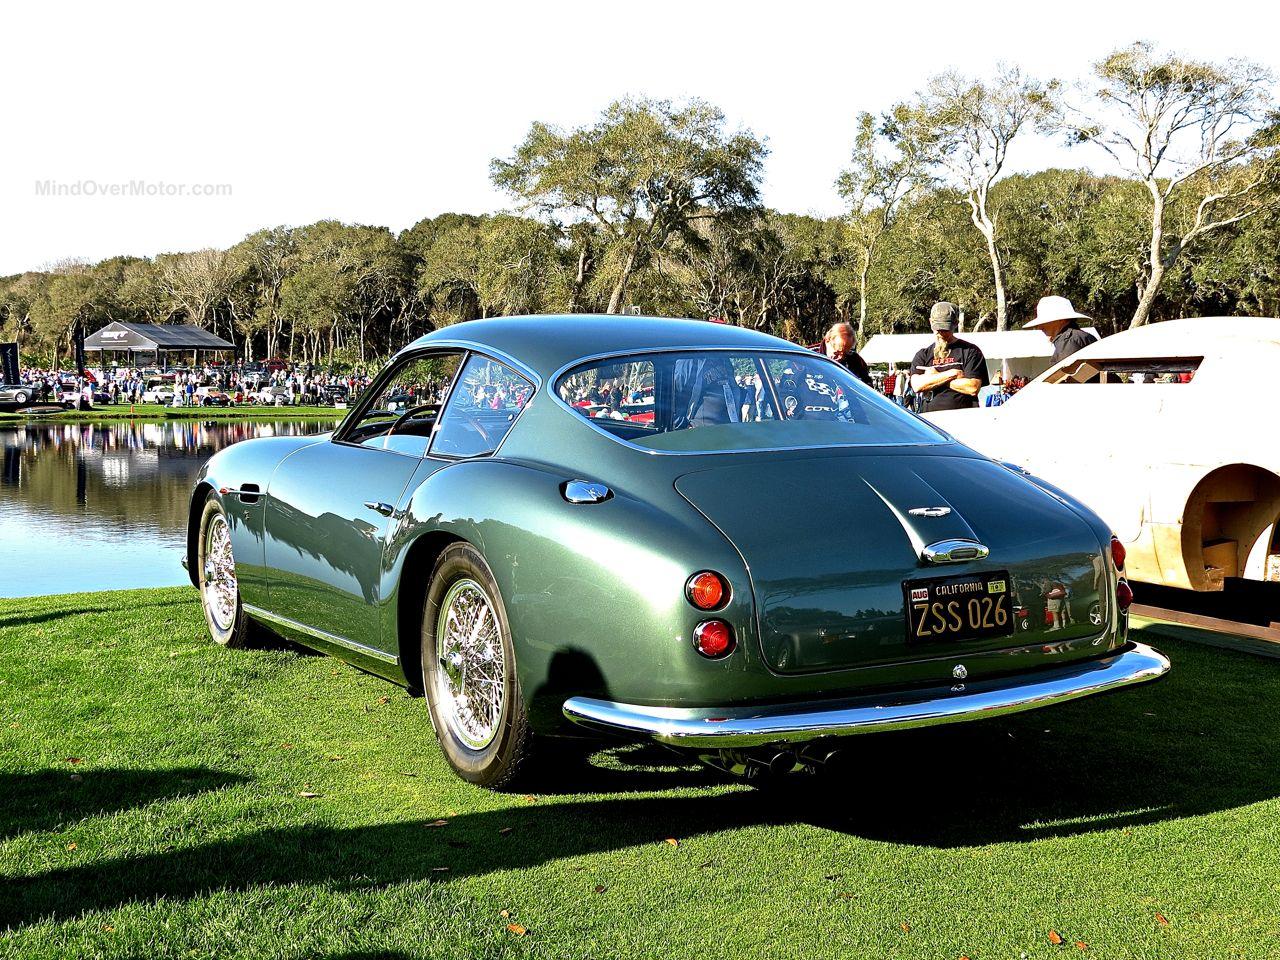 Aston Martin DB4 GT Zagato Amelia Island 6